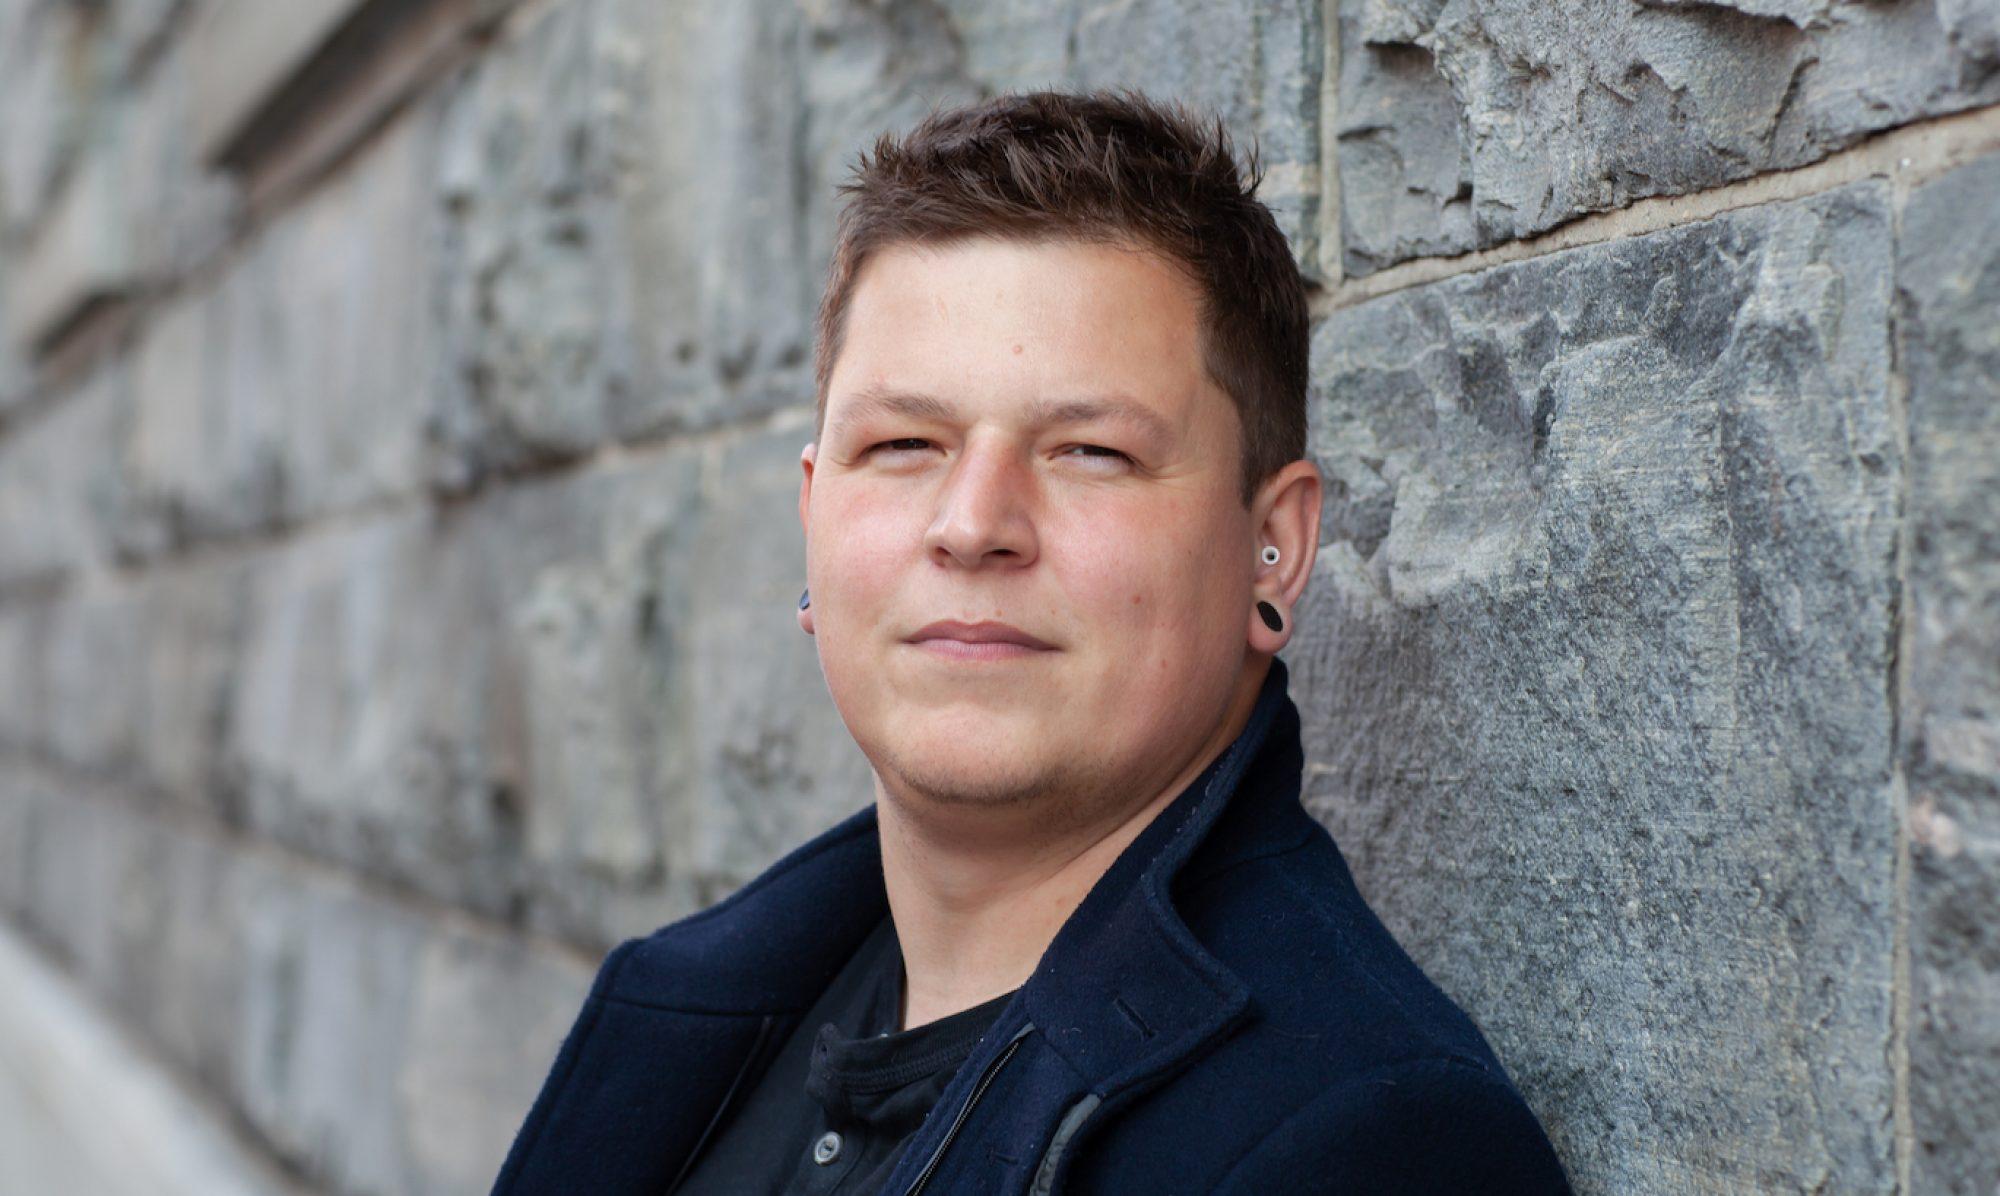 Christian Lomsdalen